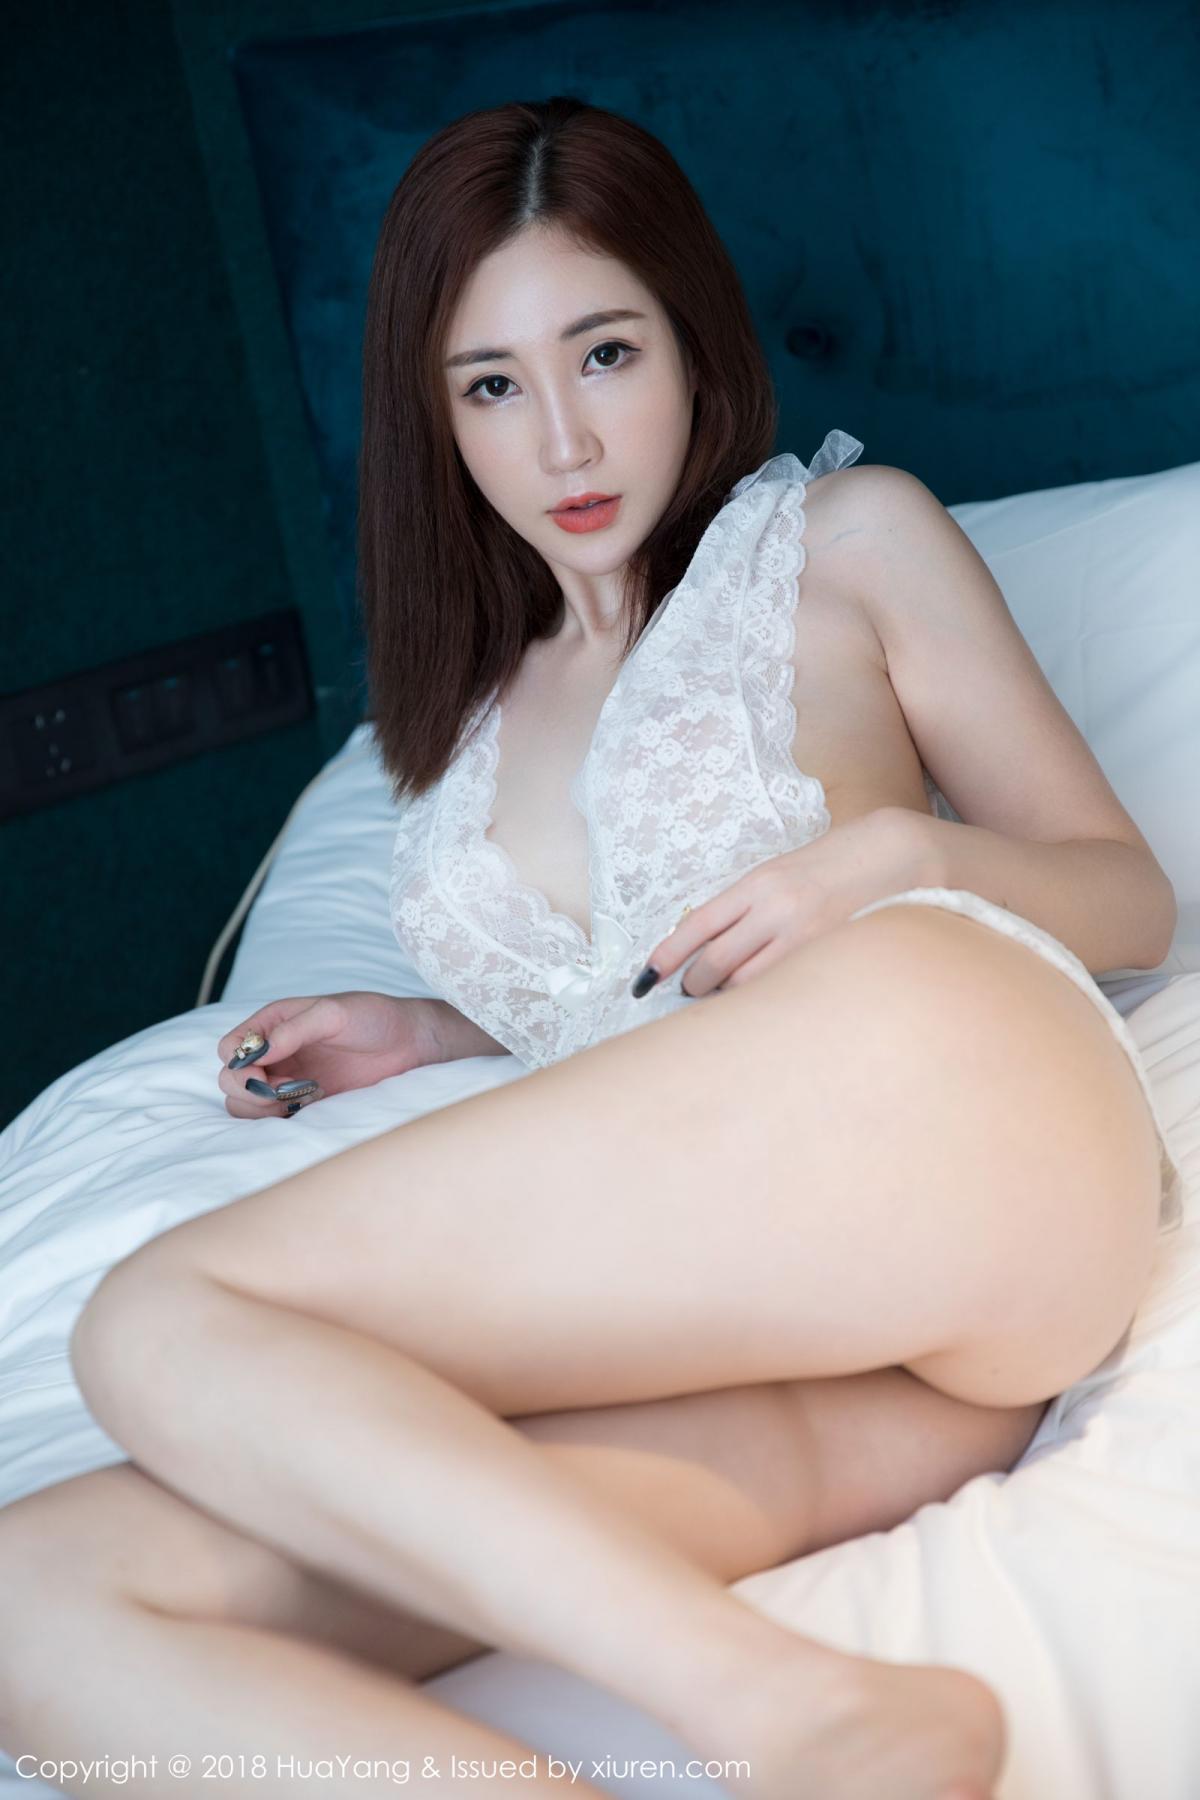 [Huayang] Vol.077 Sun Meng Yao 28P, Adult, Big Booty, HuaYang, Sun Meng Yao, Underwear